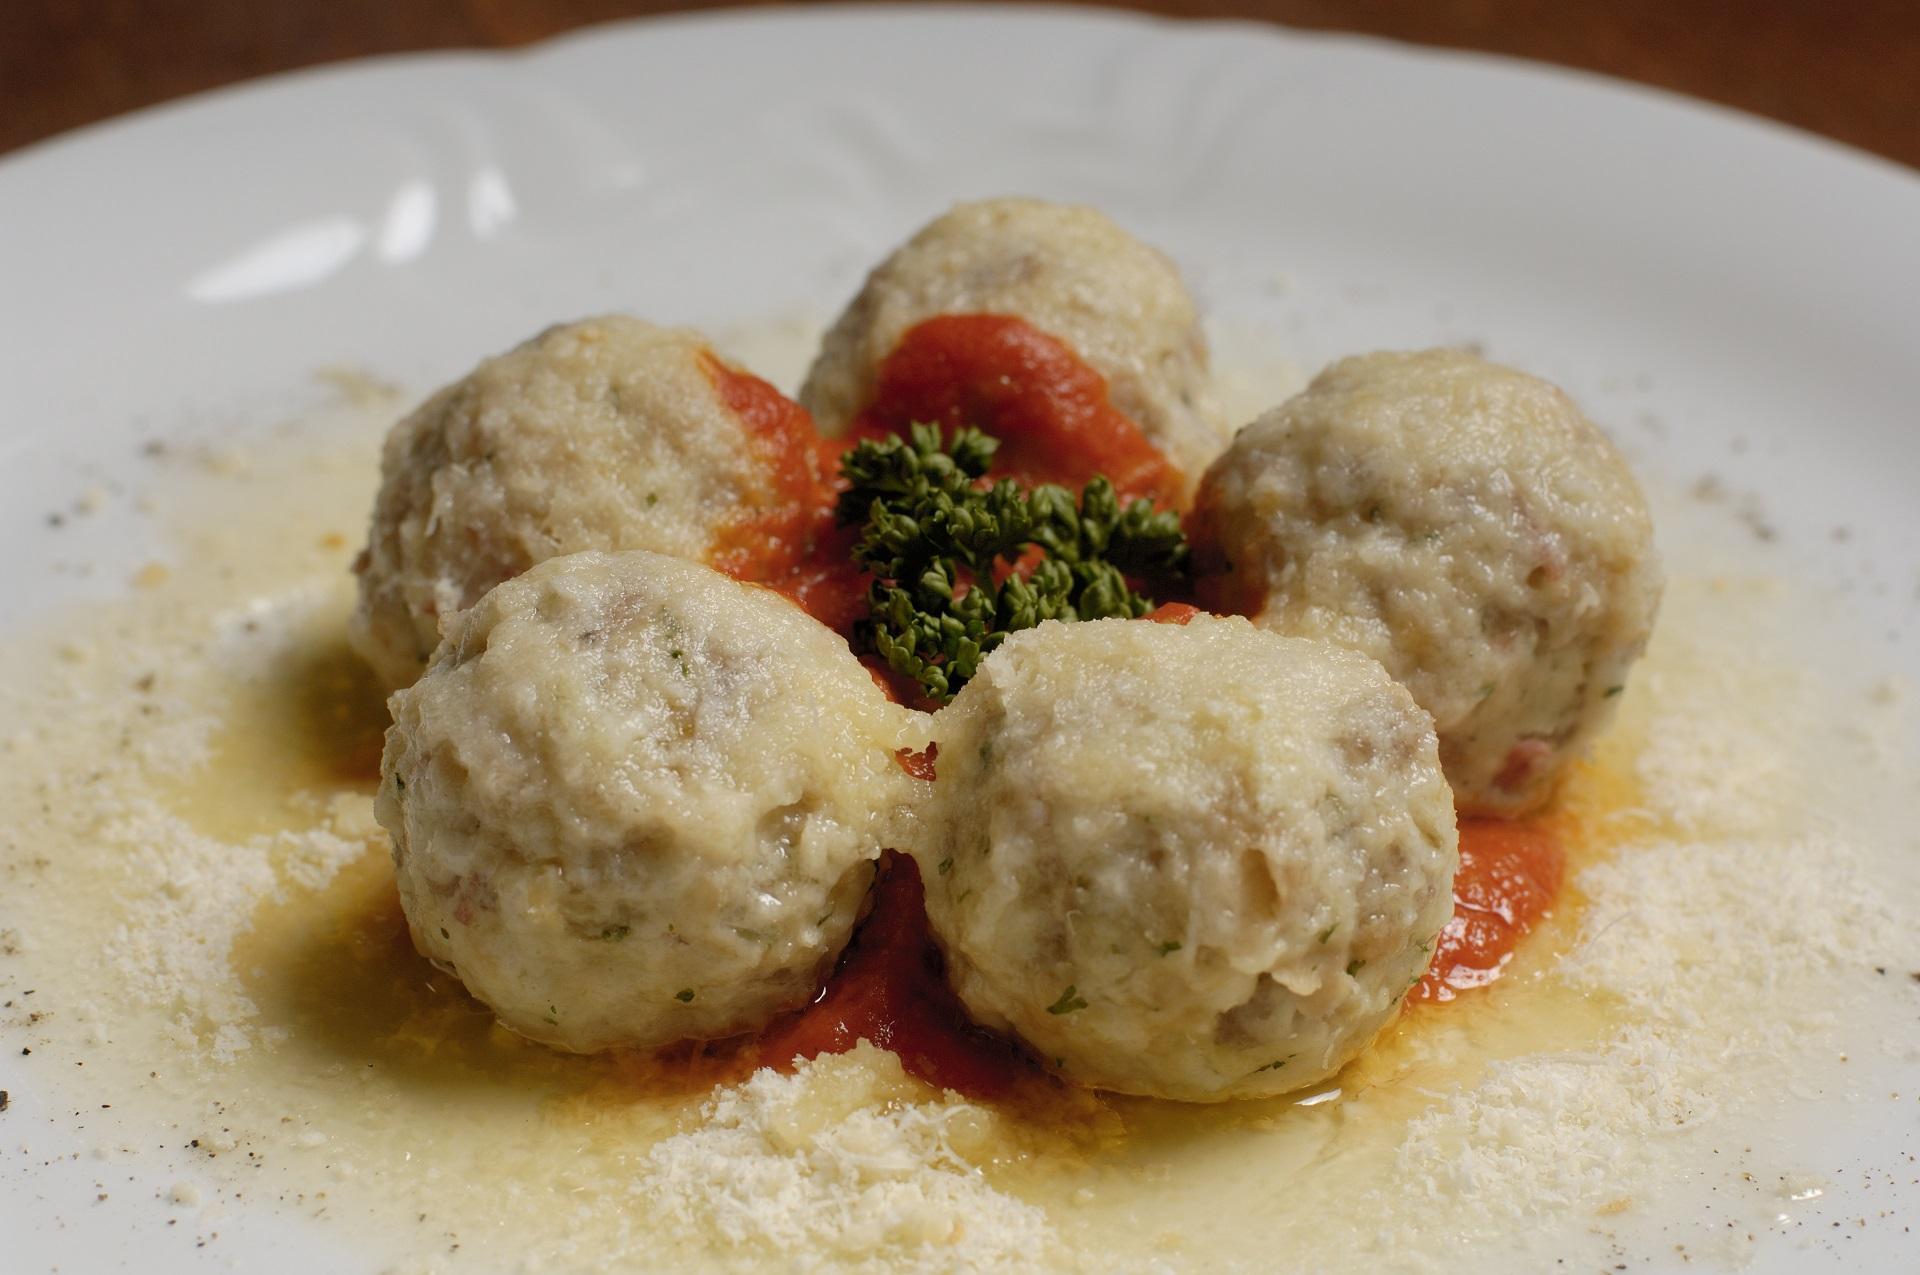 canederli_cucina_gastronomia_ph.Ronny_Kiaulehn_2.jpg